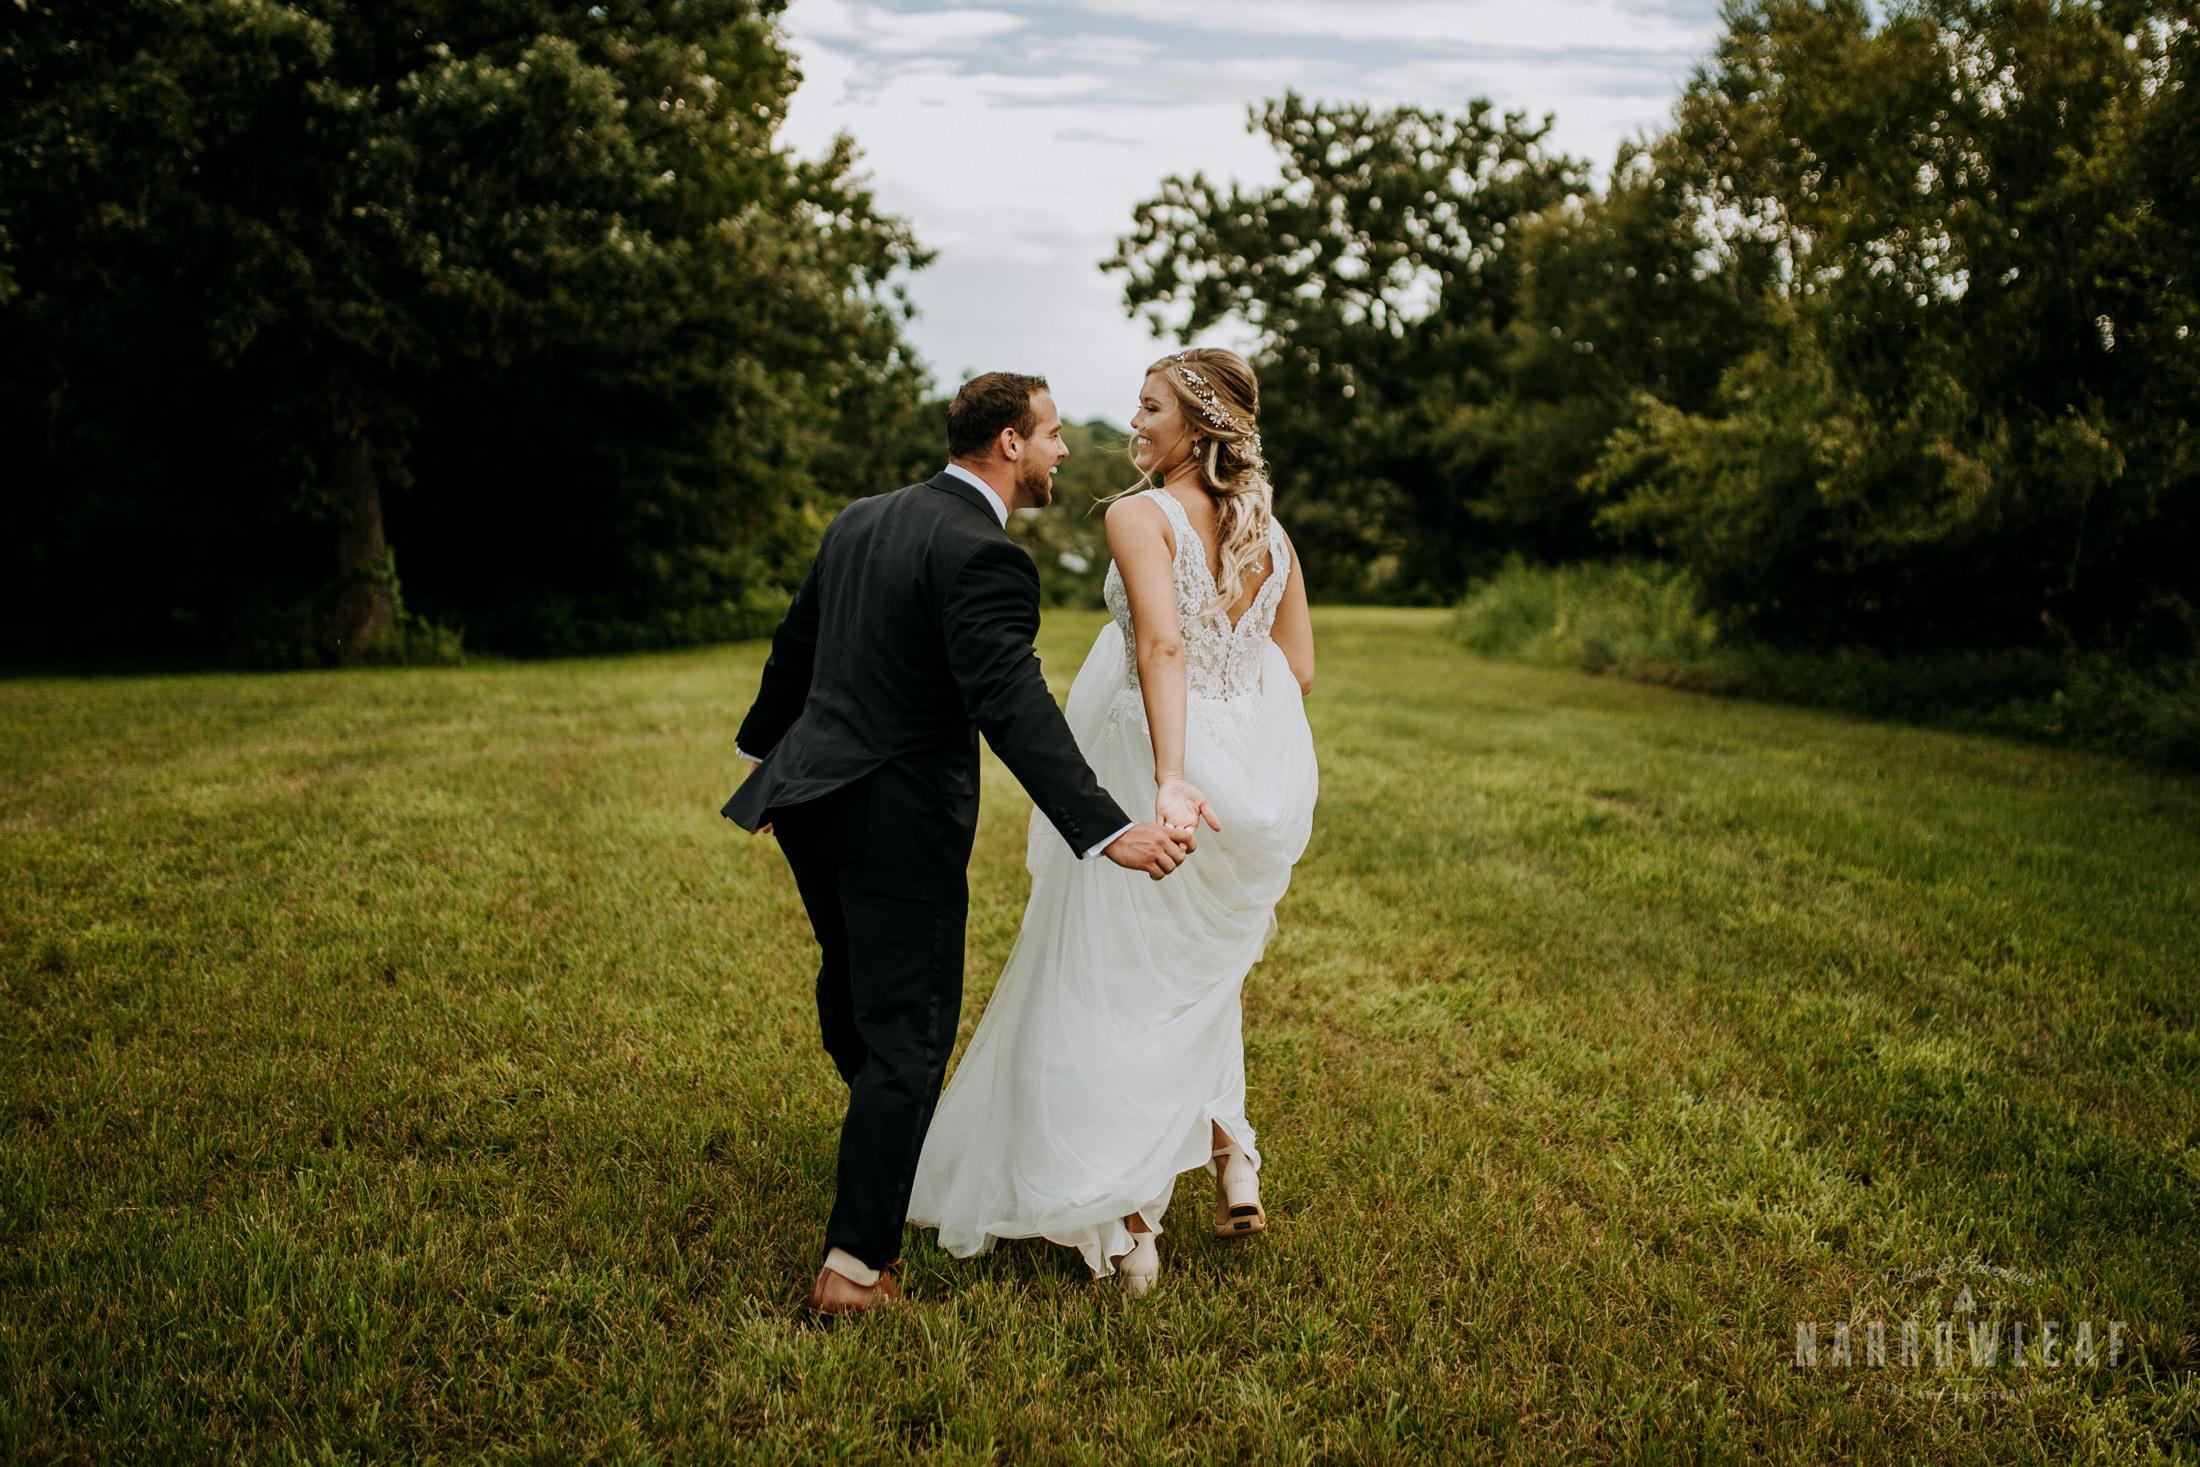 John-P-Furber-Farm-Minnesota-wedding-photographer-Narrowleaf_Love_and_Adventure_Photography-8770.jpg